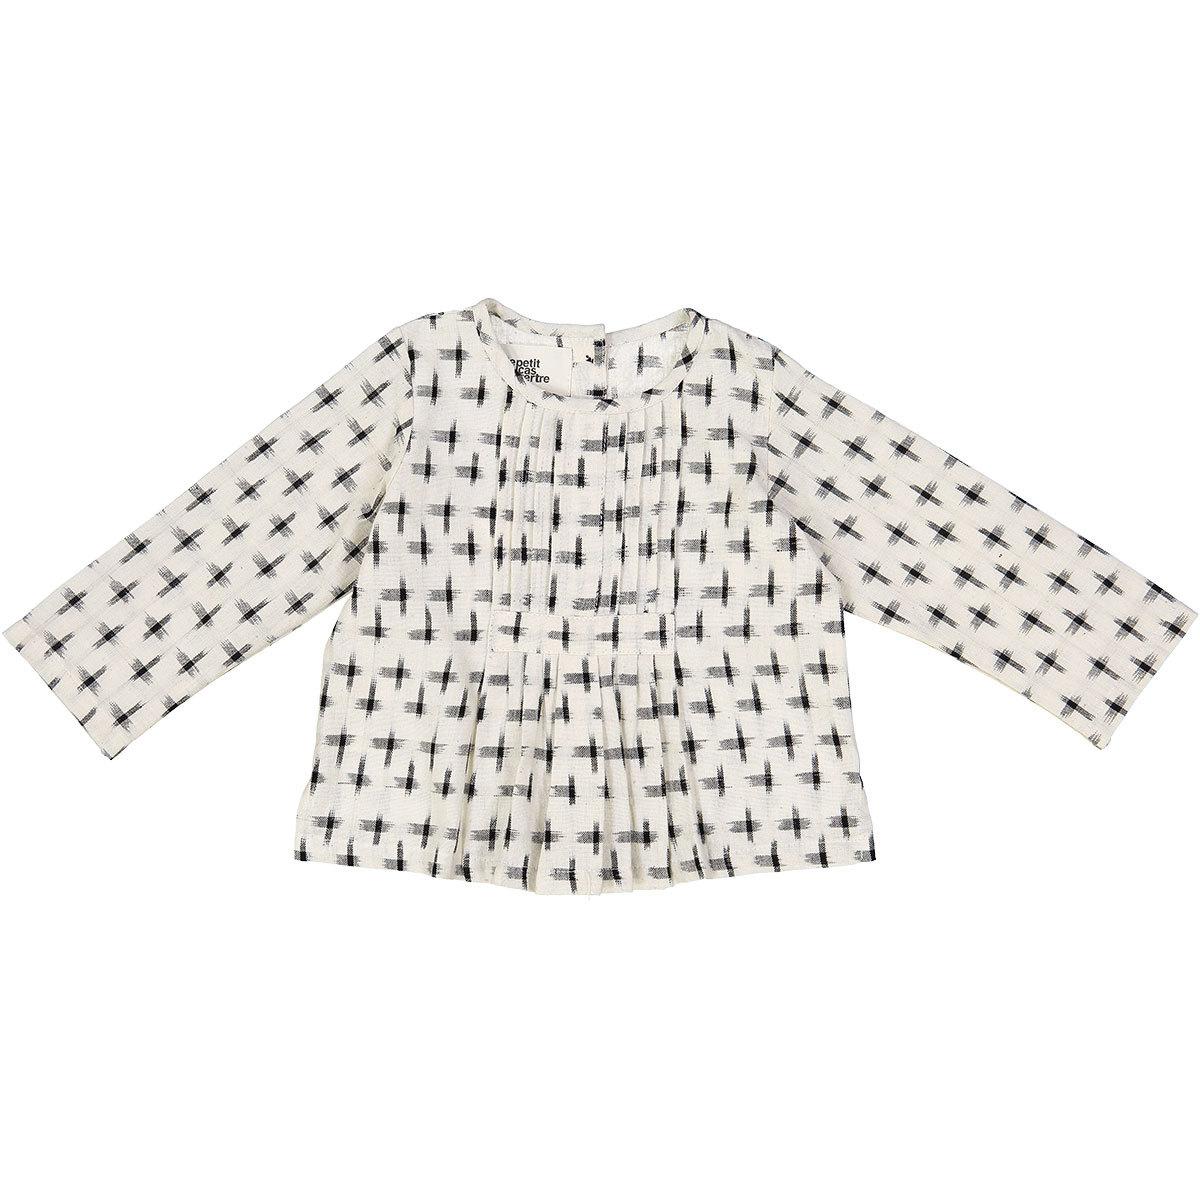 Hauts bébé Top Kush - Grey Checks Ikat - 3/6 Mois Top Kush - Grey Checks Ikat - 3/6 Mois